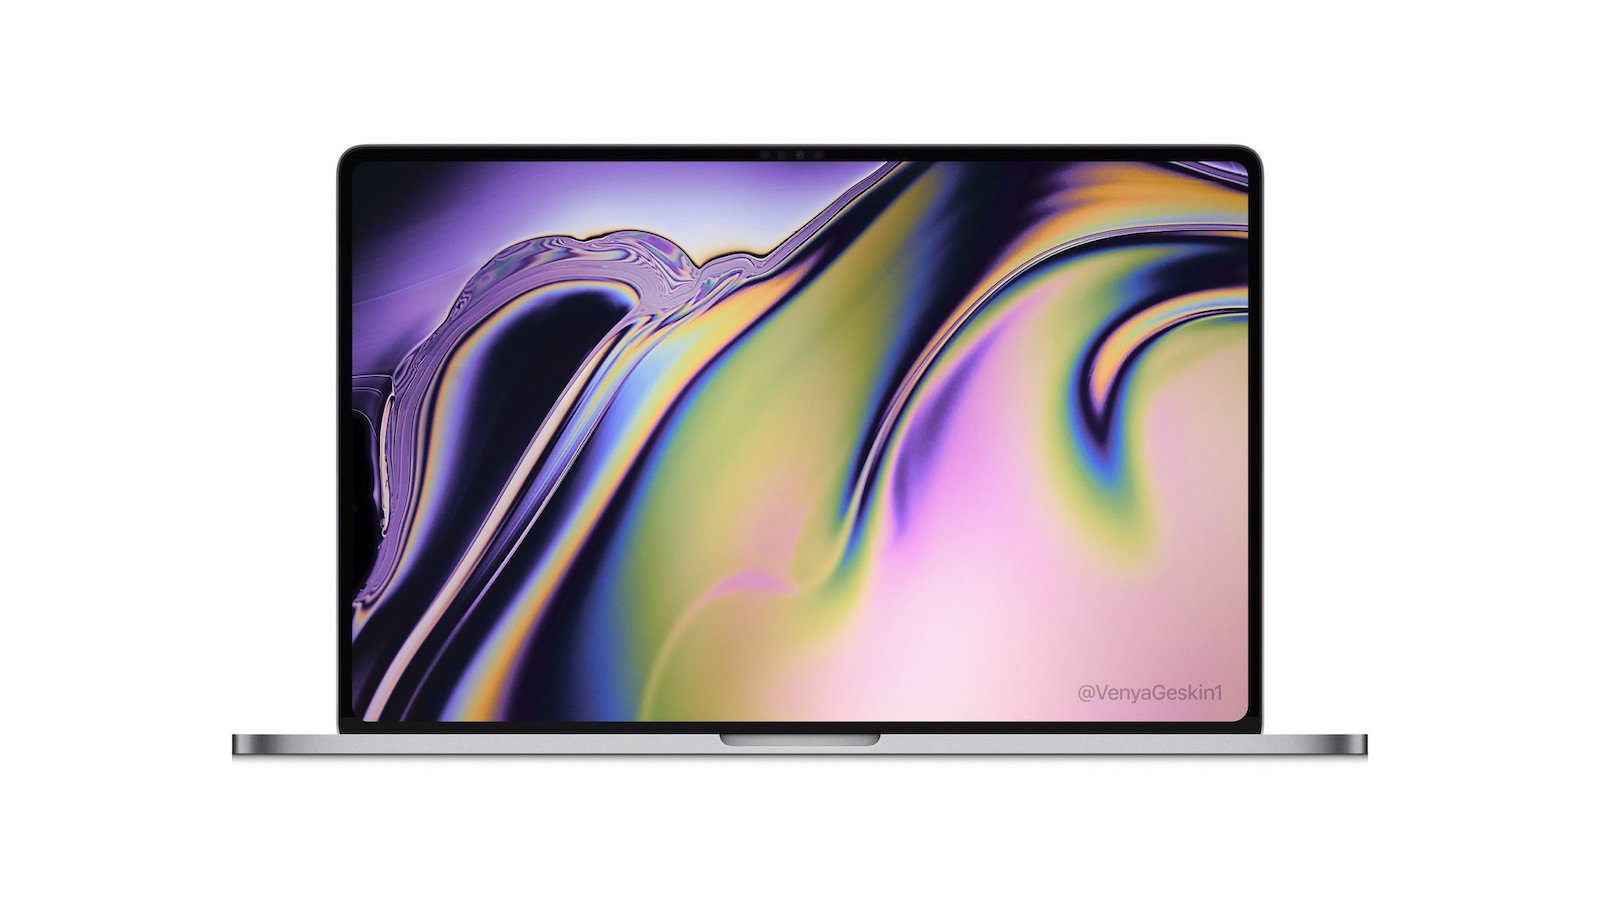 macbook-pro-2020-16inch-concept.jpeg